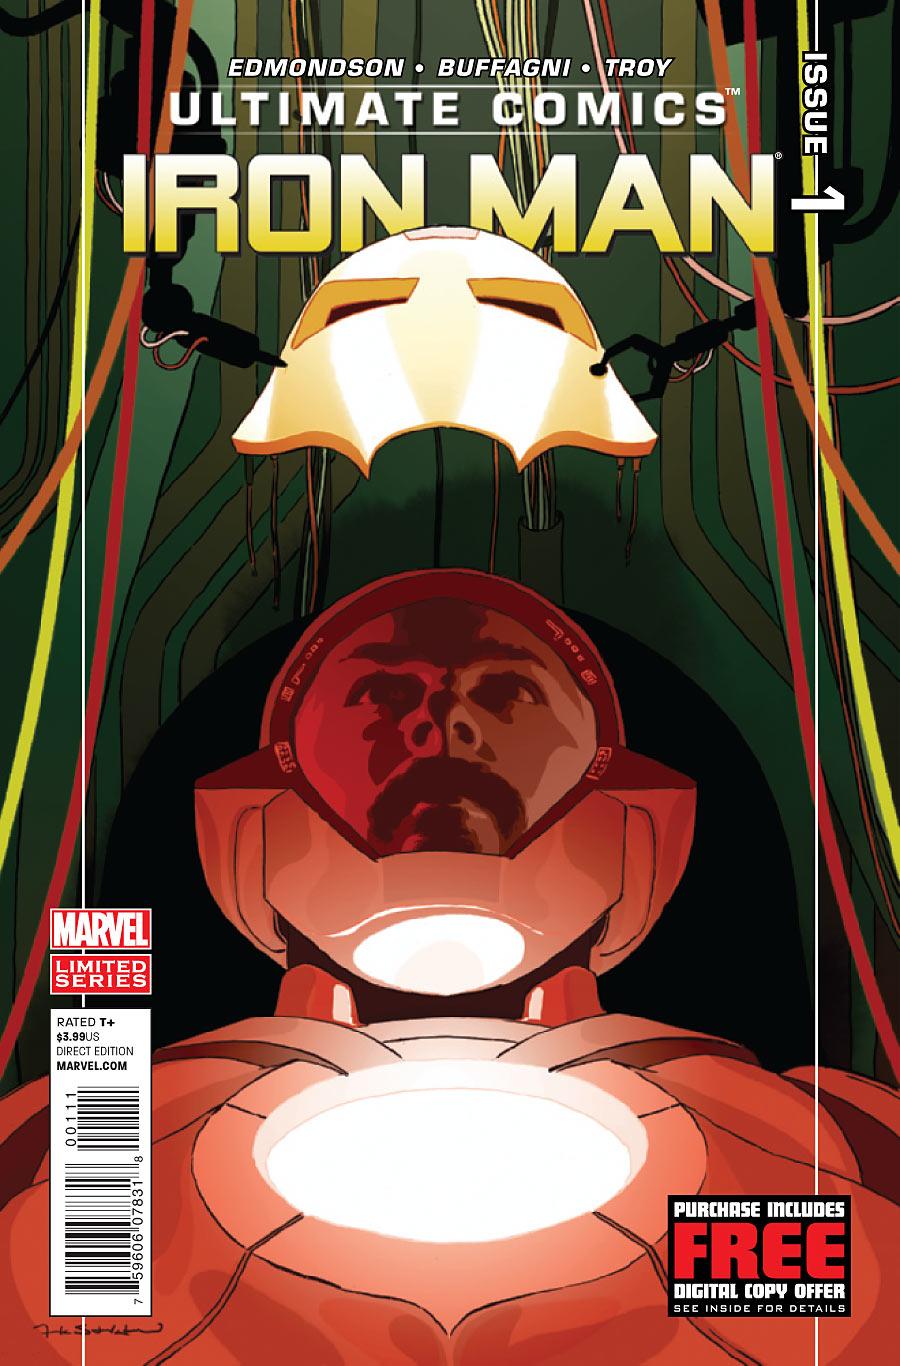 Ultimate Comics Iron Man Vol 1 1